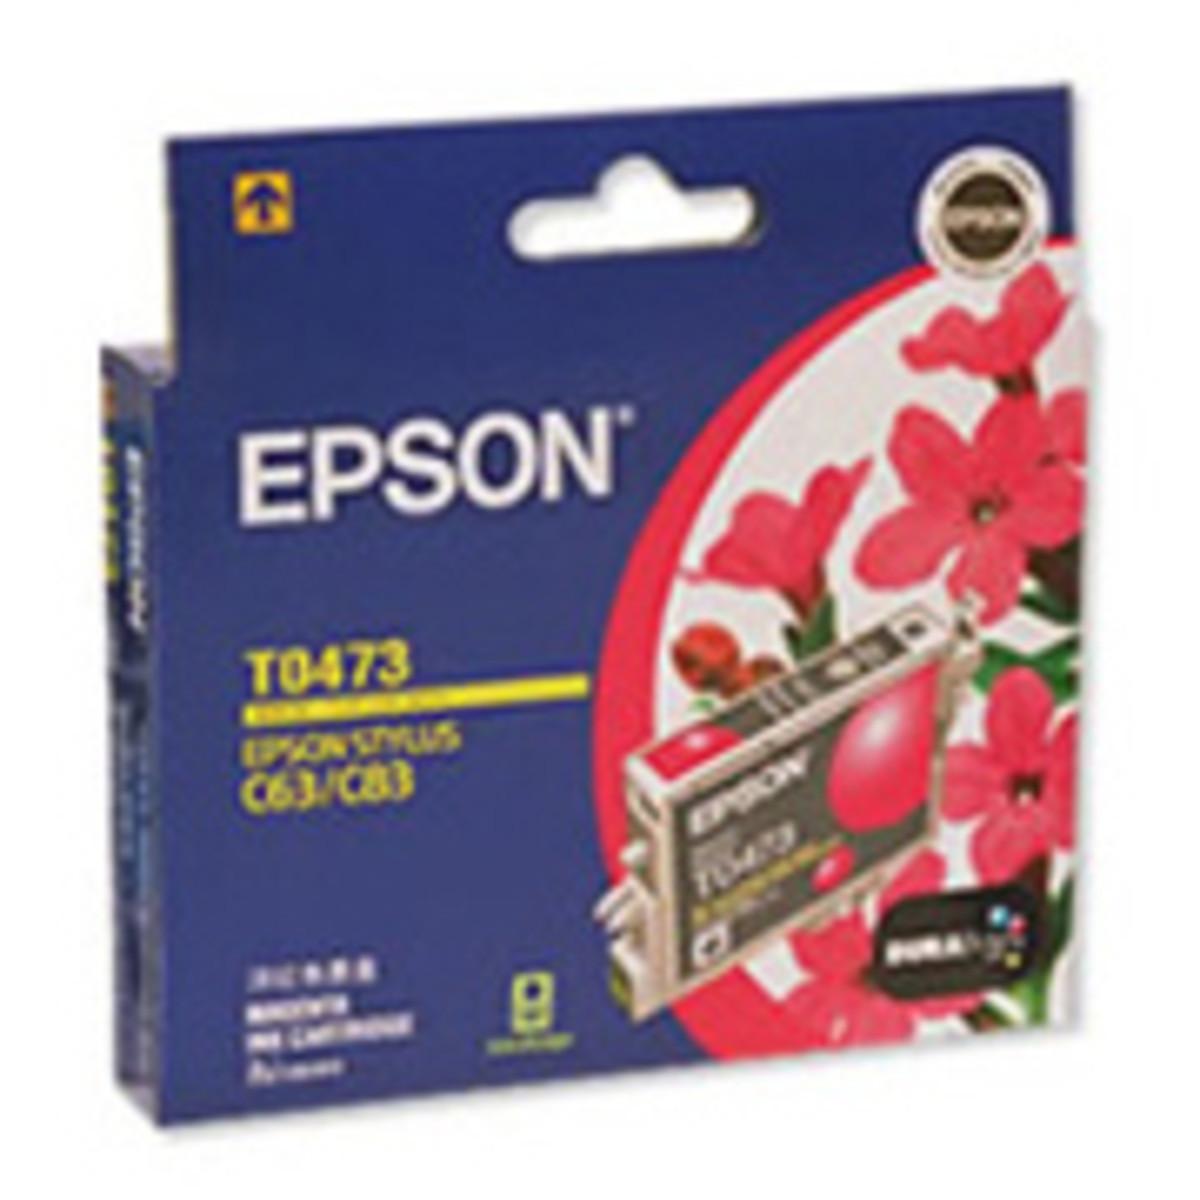 Epson T047390 Magenta Ink Cartridge